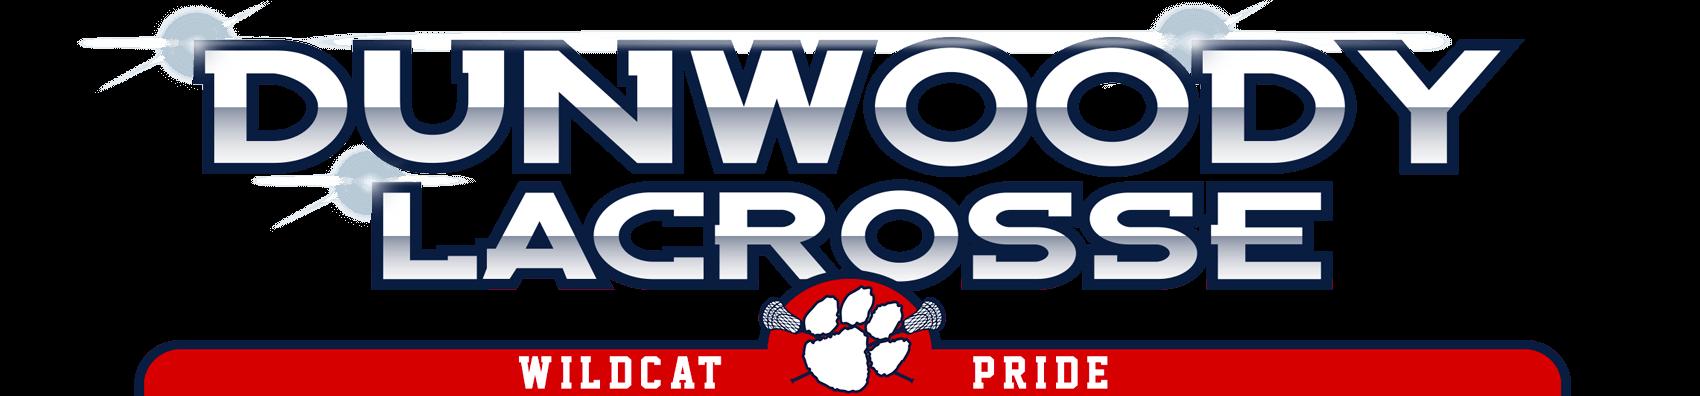 Dunwoody High School Lacrosse, Lacrosse, Goal, Field